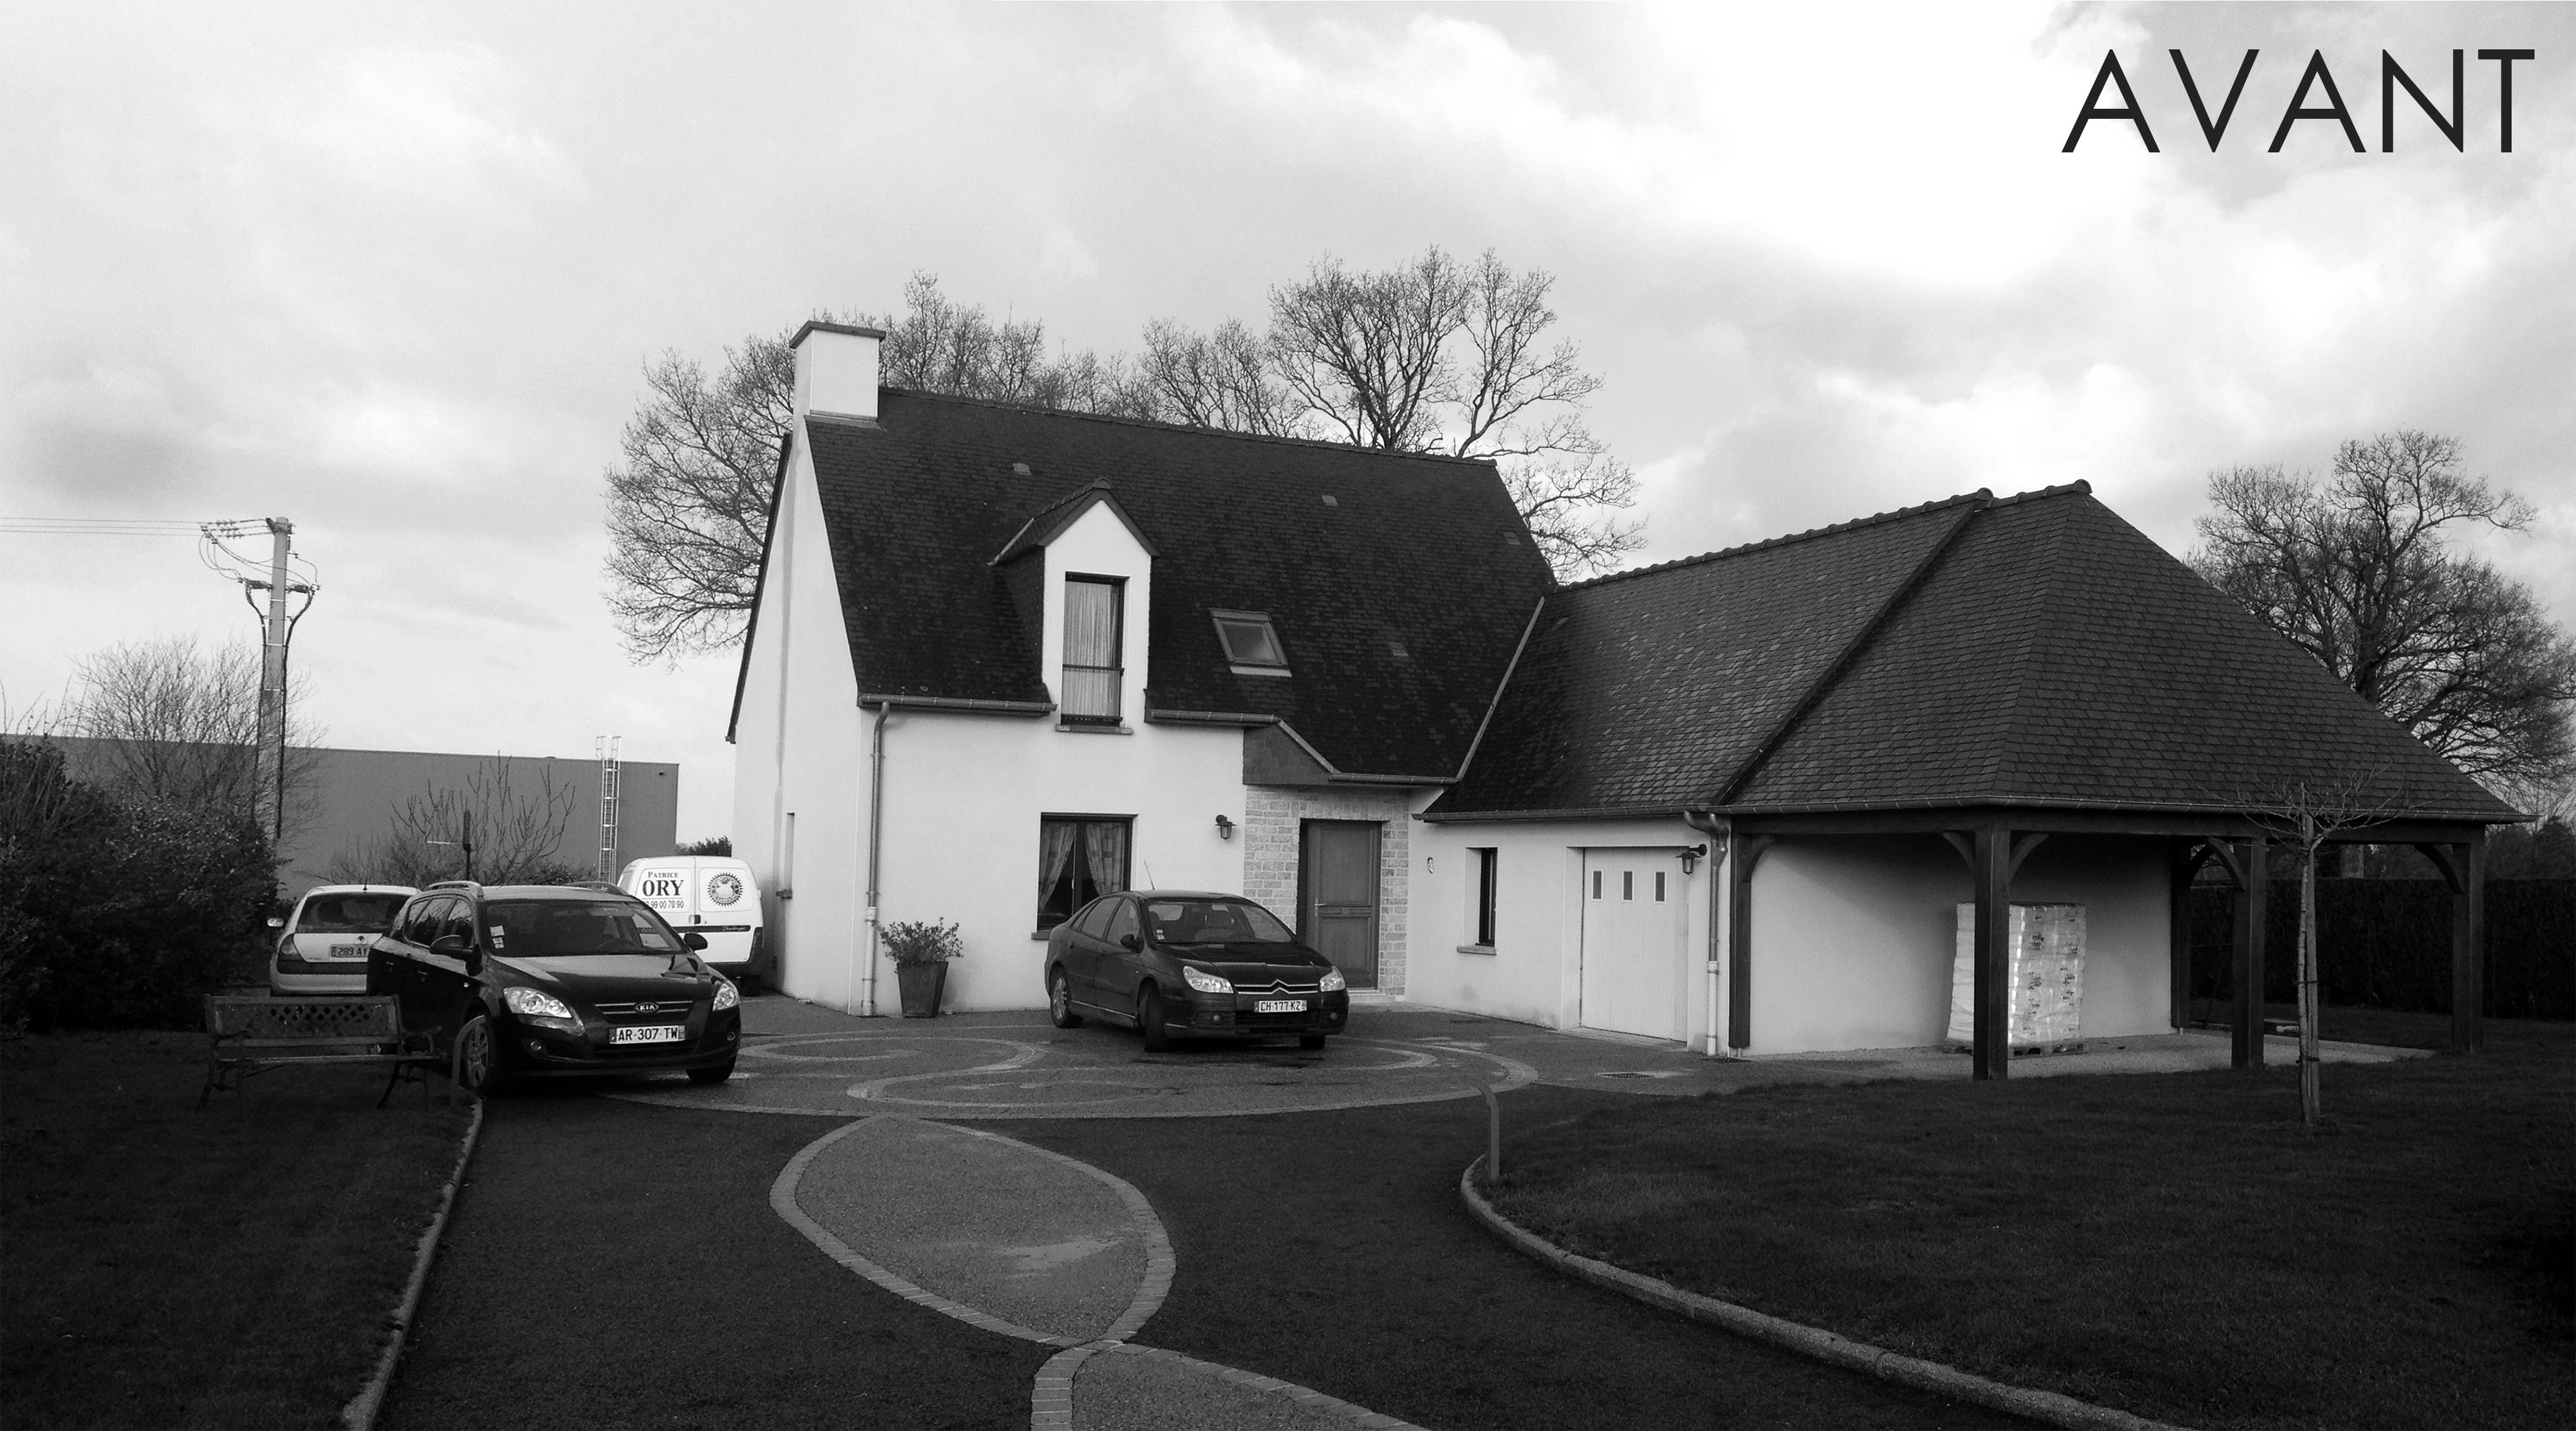 Projet oo sjv 1 2 vue architecte lise roturier for Agrandissement maison rennes